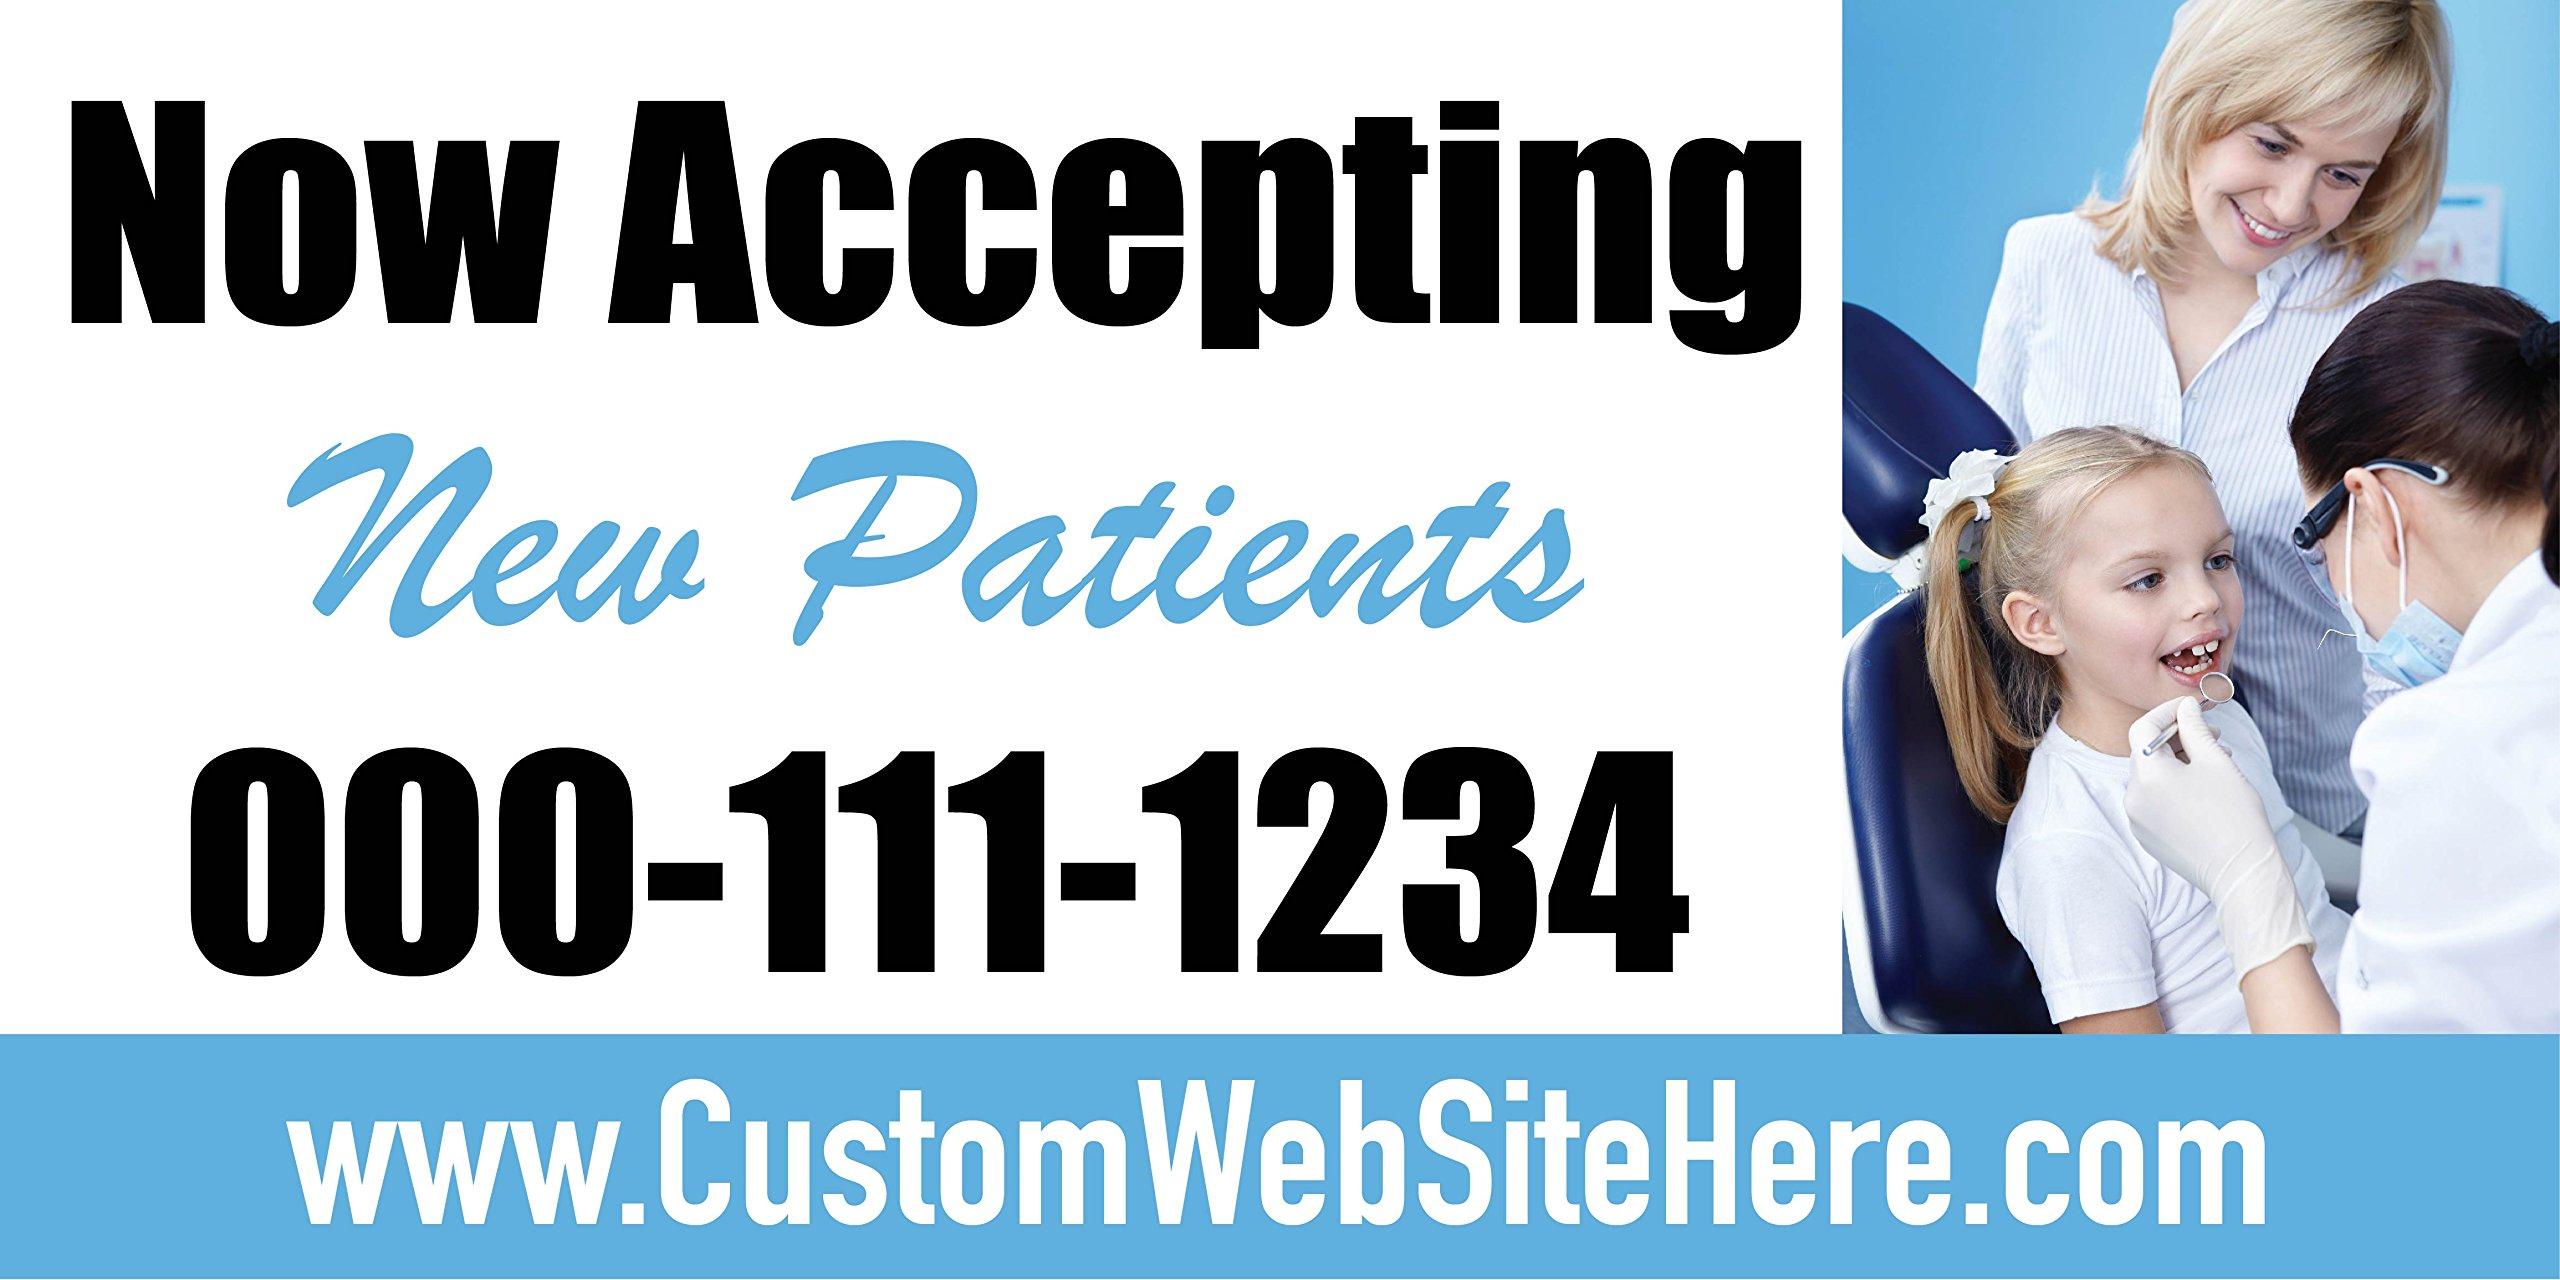 Custom Printed Dentist Banner - New Patients Kid (10' x 5')